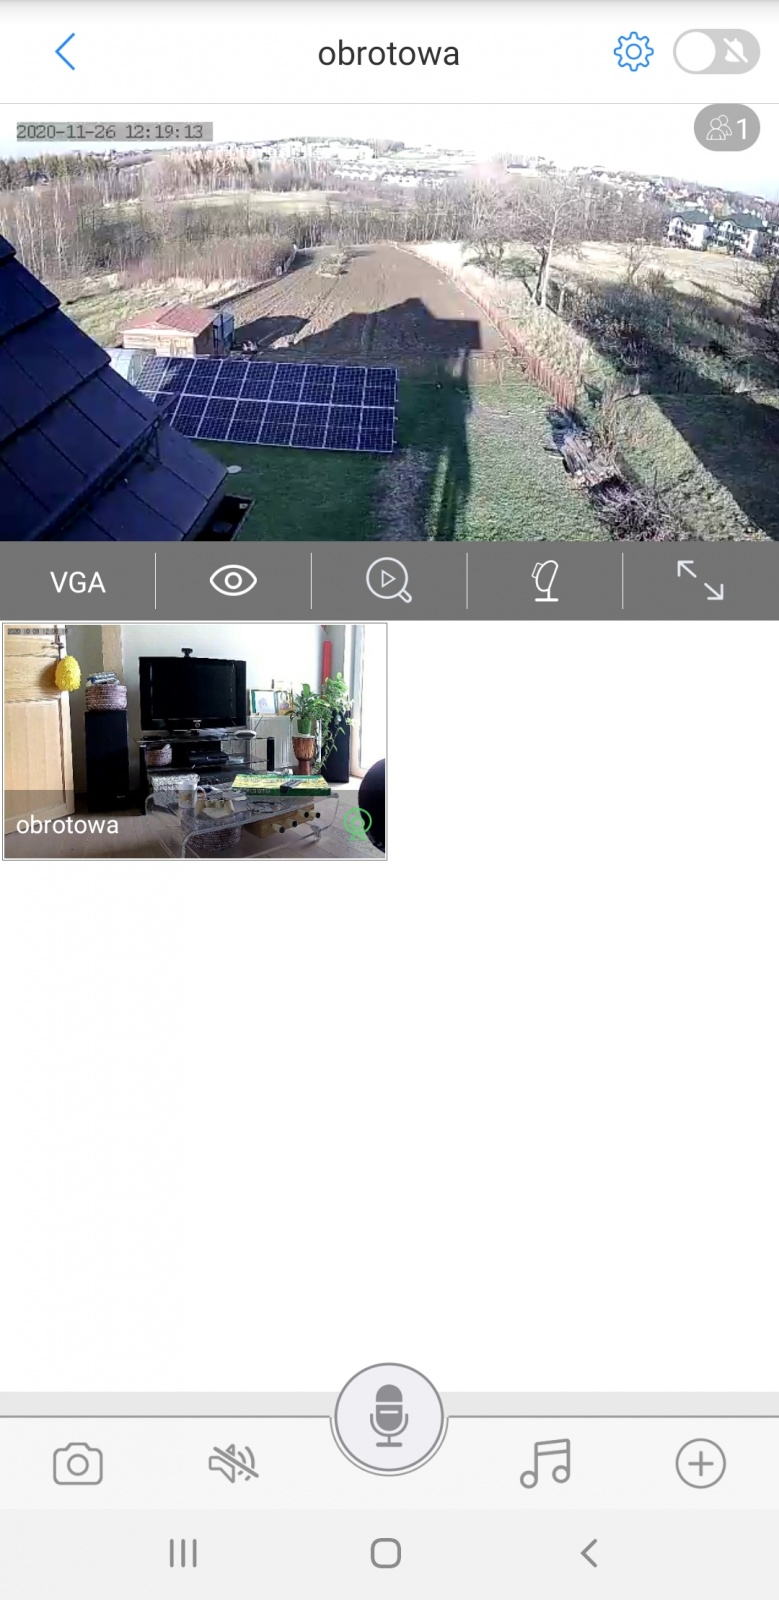 Screenshot_20201126-121915.thumb.jpg.0c3db5cbc6e8f49a36d87620a2da59d3.jpg